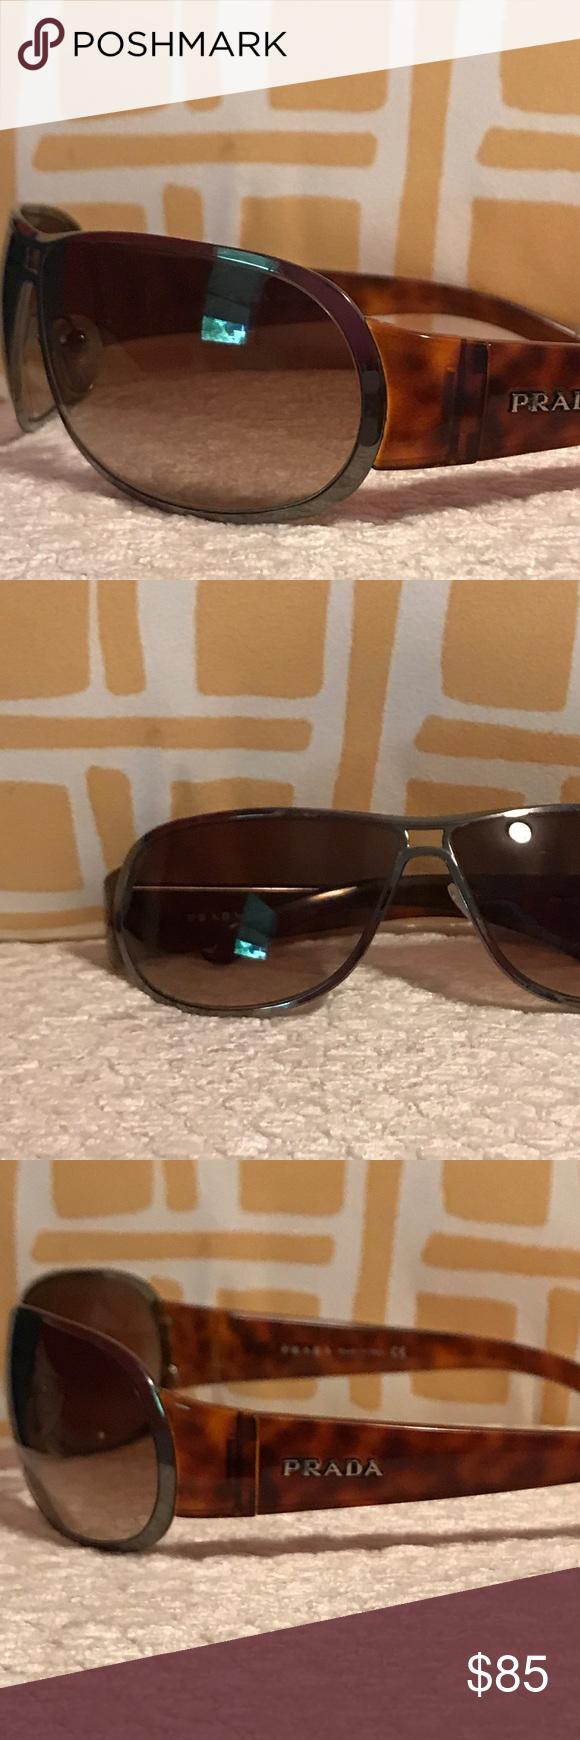 cdbfbba87b7 ... 50% off prada spr 70g sunglasses prada spr 70g sunglasses model spr 70g  prada color